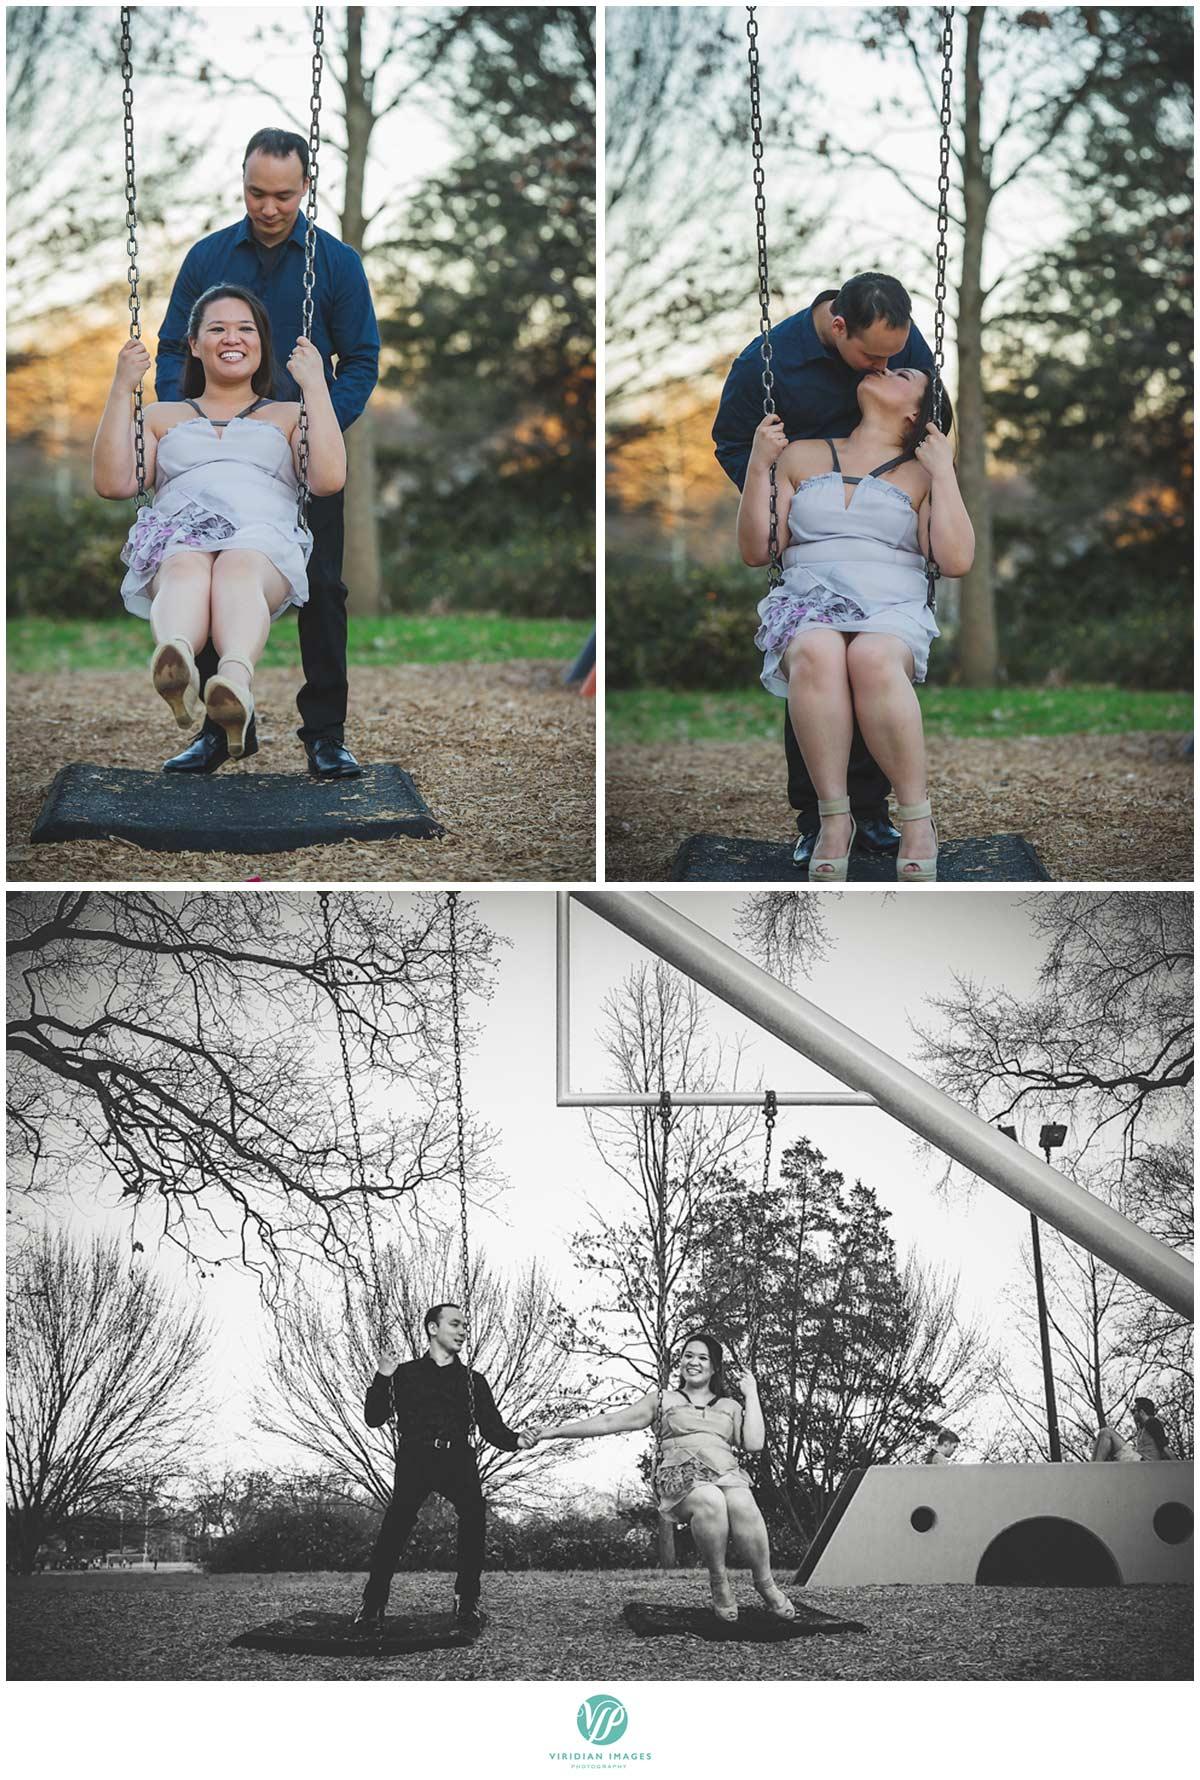 Atlanta_Piedmont_Park_engagement_session_Viridian_Images_Photography_photo-8